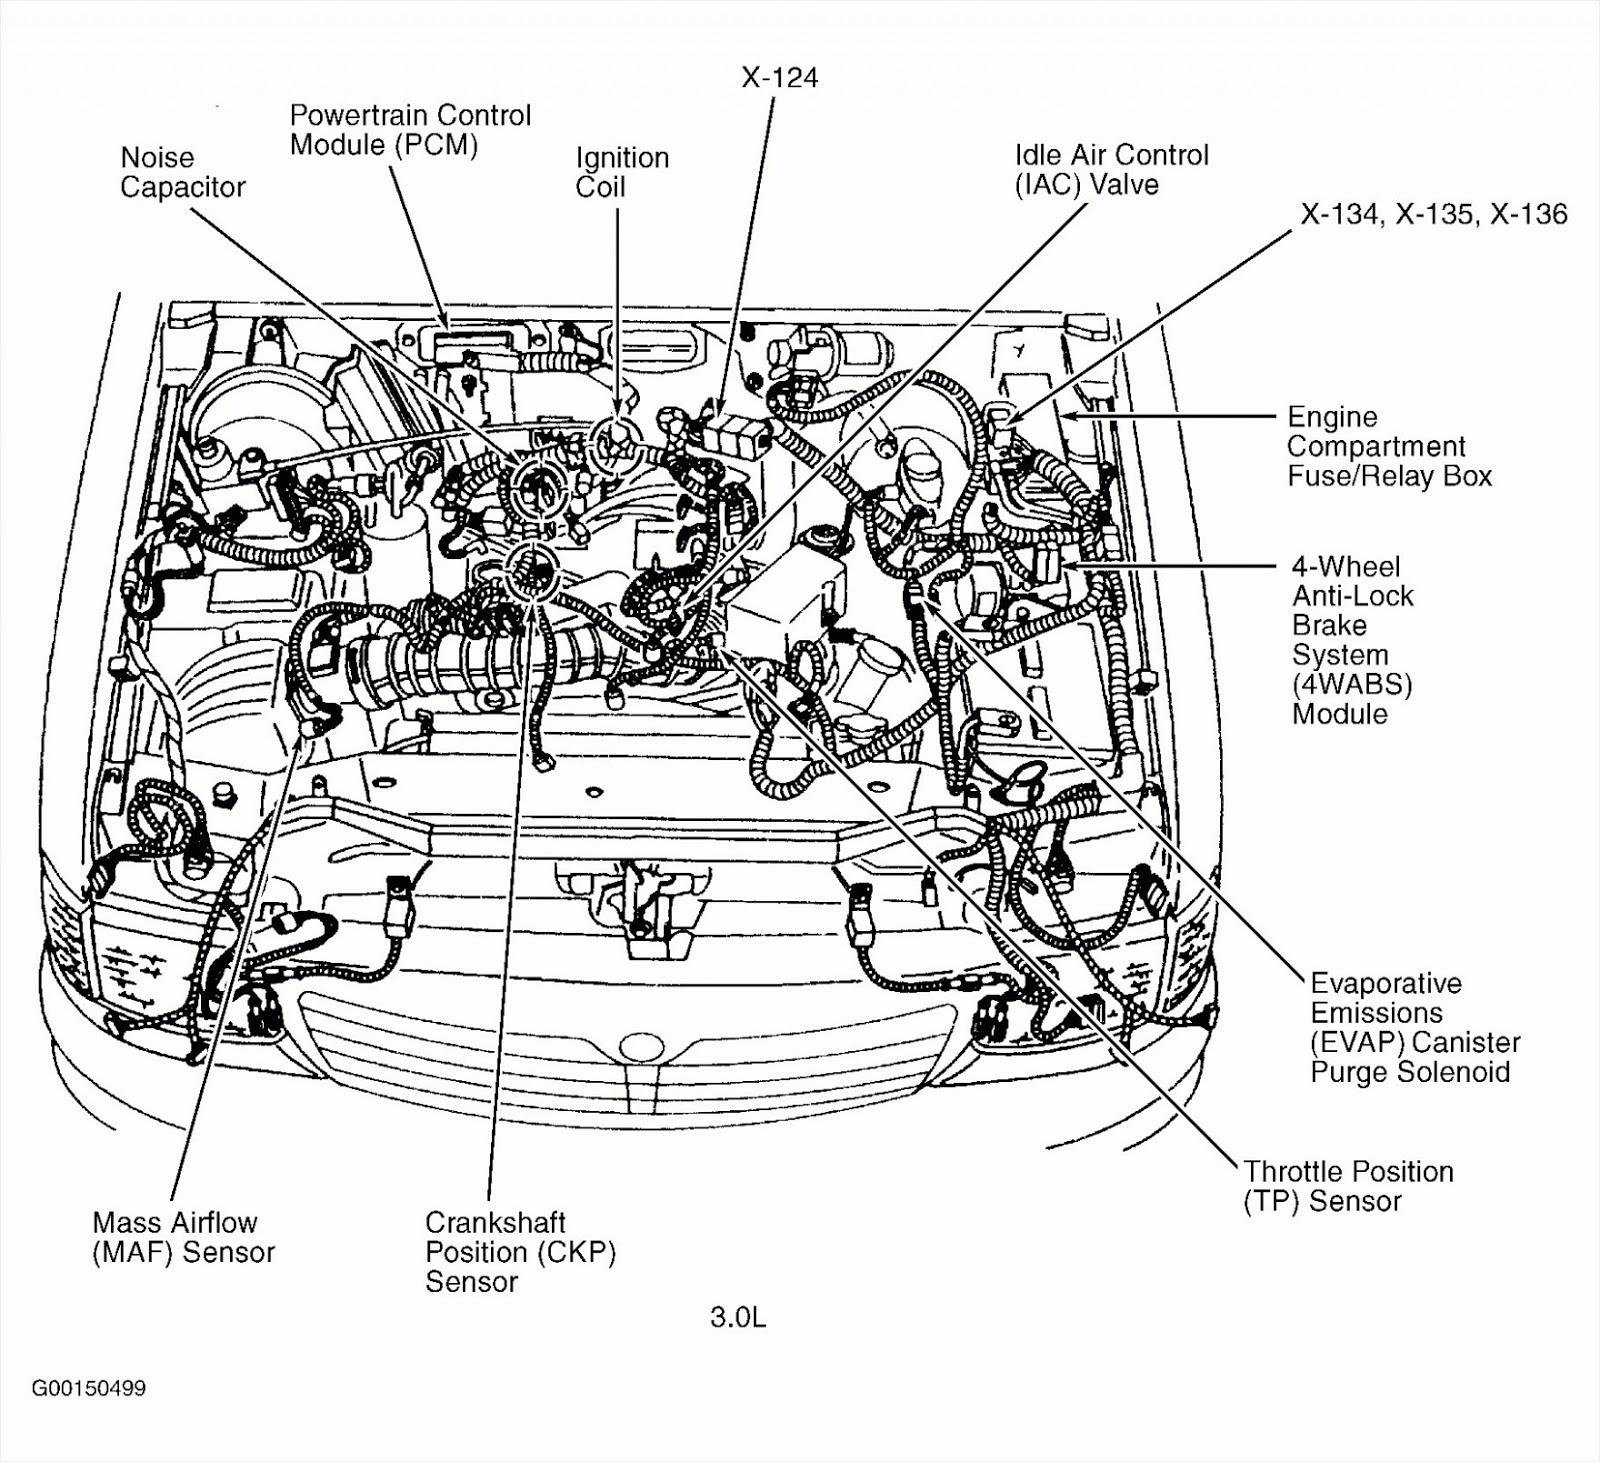 2001 ford 4 6 engine diagram - wiring diagram poised-upgrade-b -  poised-upgrade-b.agriturismoduemadonne.it  agriturismoduemadonne.it